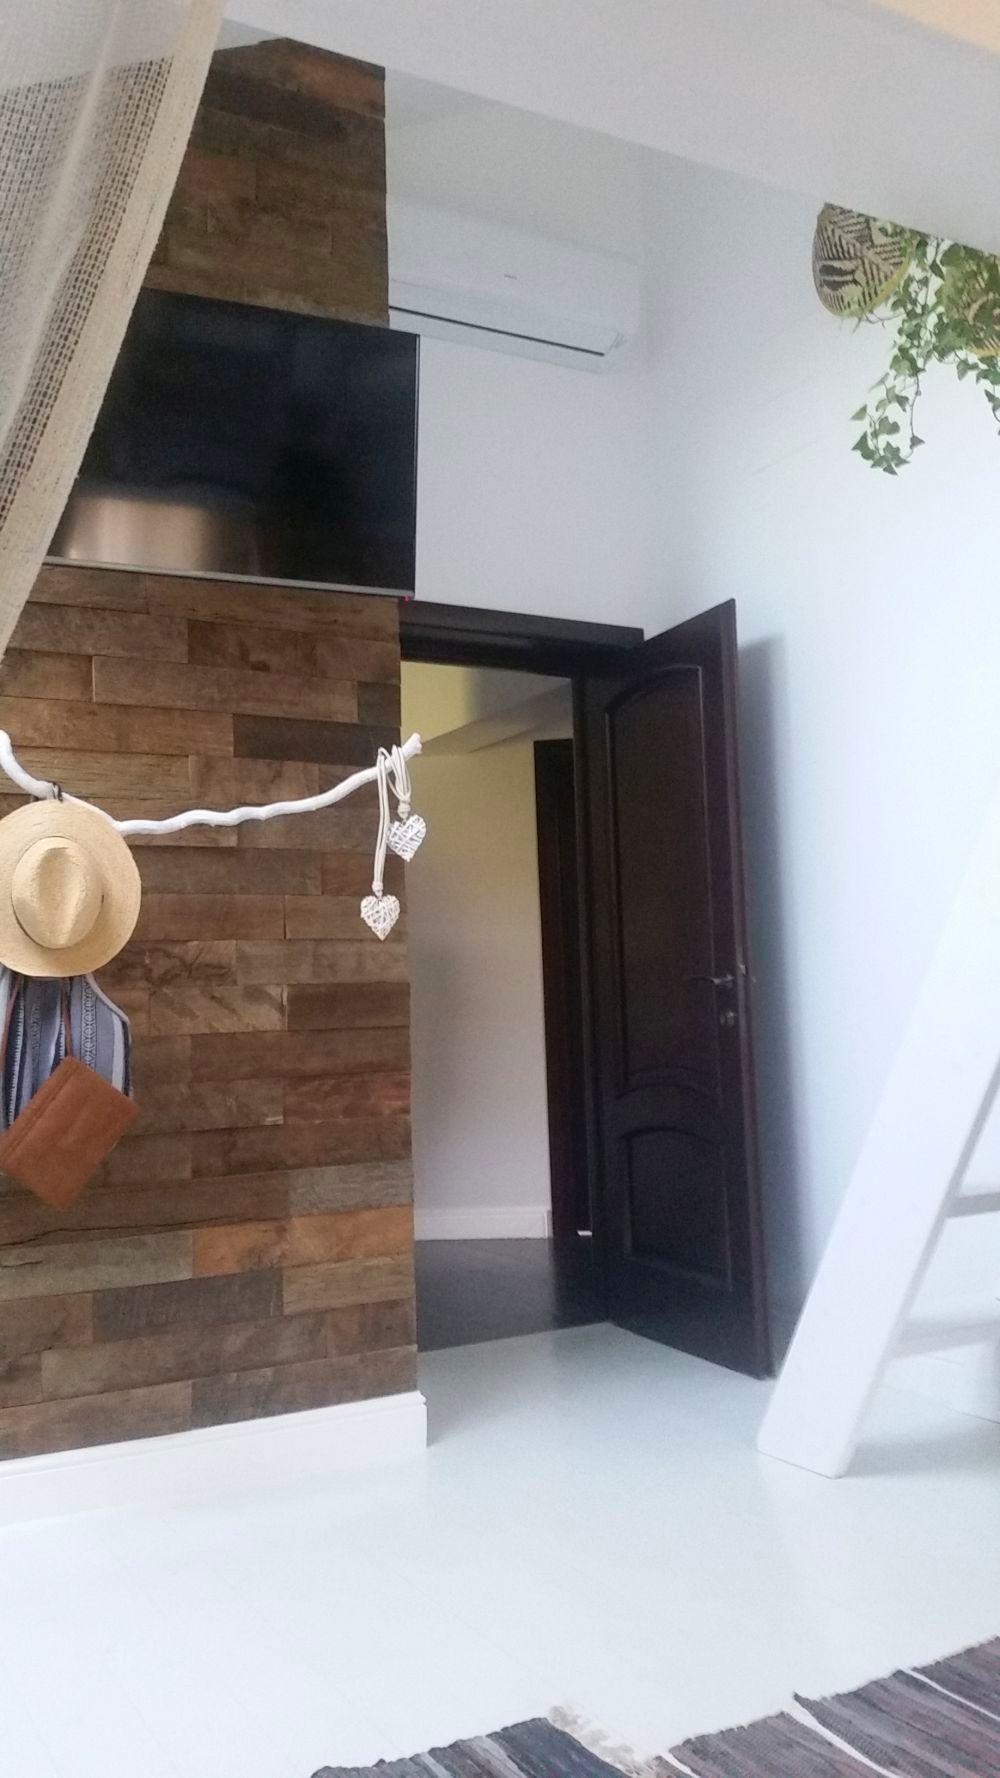 adelaparvu.com despre amenajare camera adolescenta Bucuresti, Romania, stil BoHo chic, Designer Adela Parvu, Foto Adela Parvu (22)